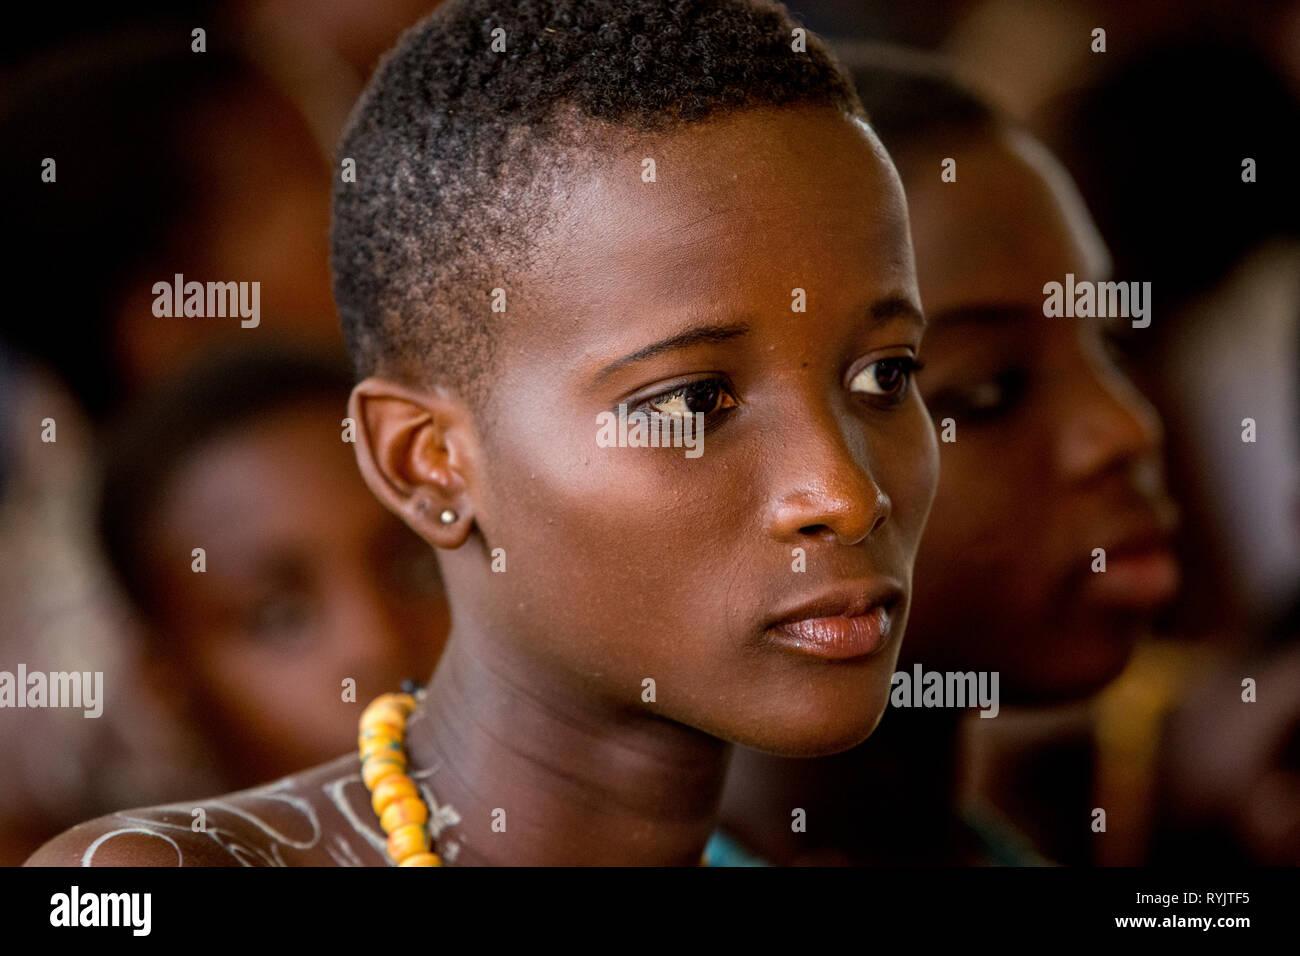 Teenager attending mass in Cristo Risorto de Hedzranawoe catholic parish church, Lomé, Togo. - Stock Image